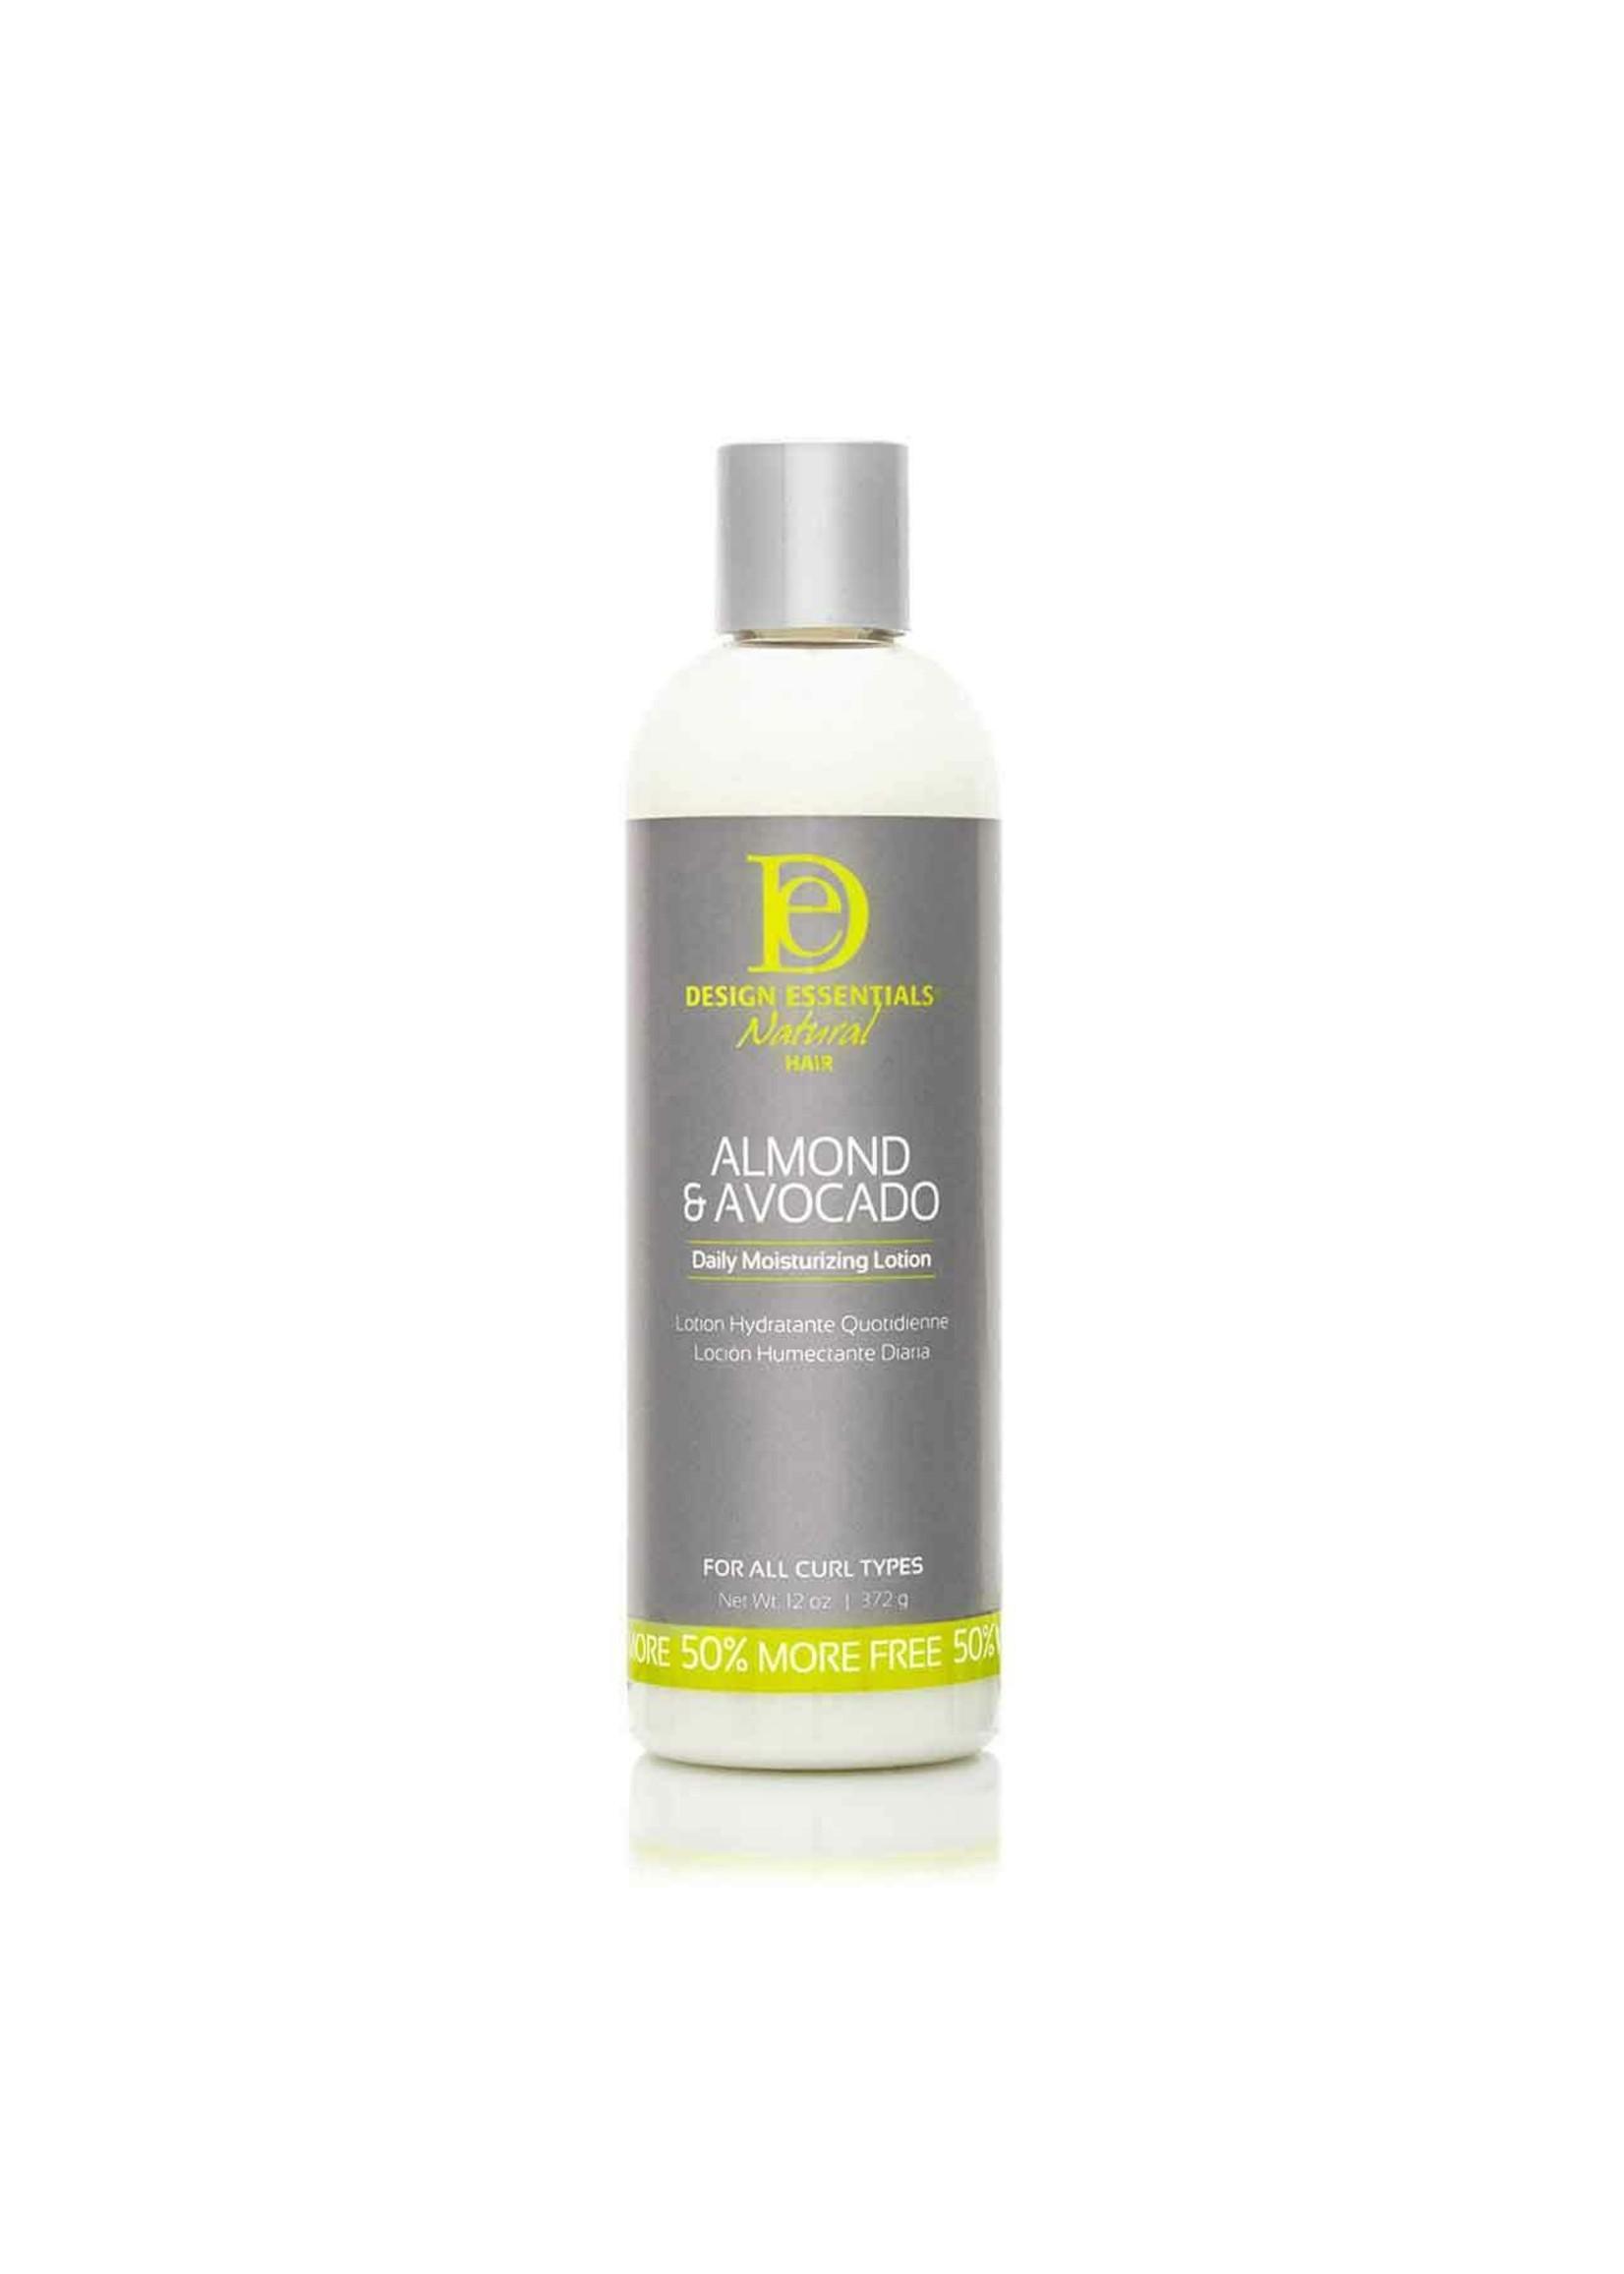 Design Essentials Almond & Avocado Daily Moisturizing Lotion